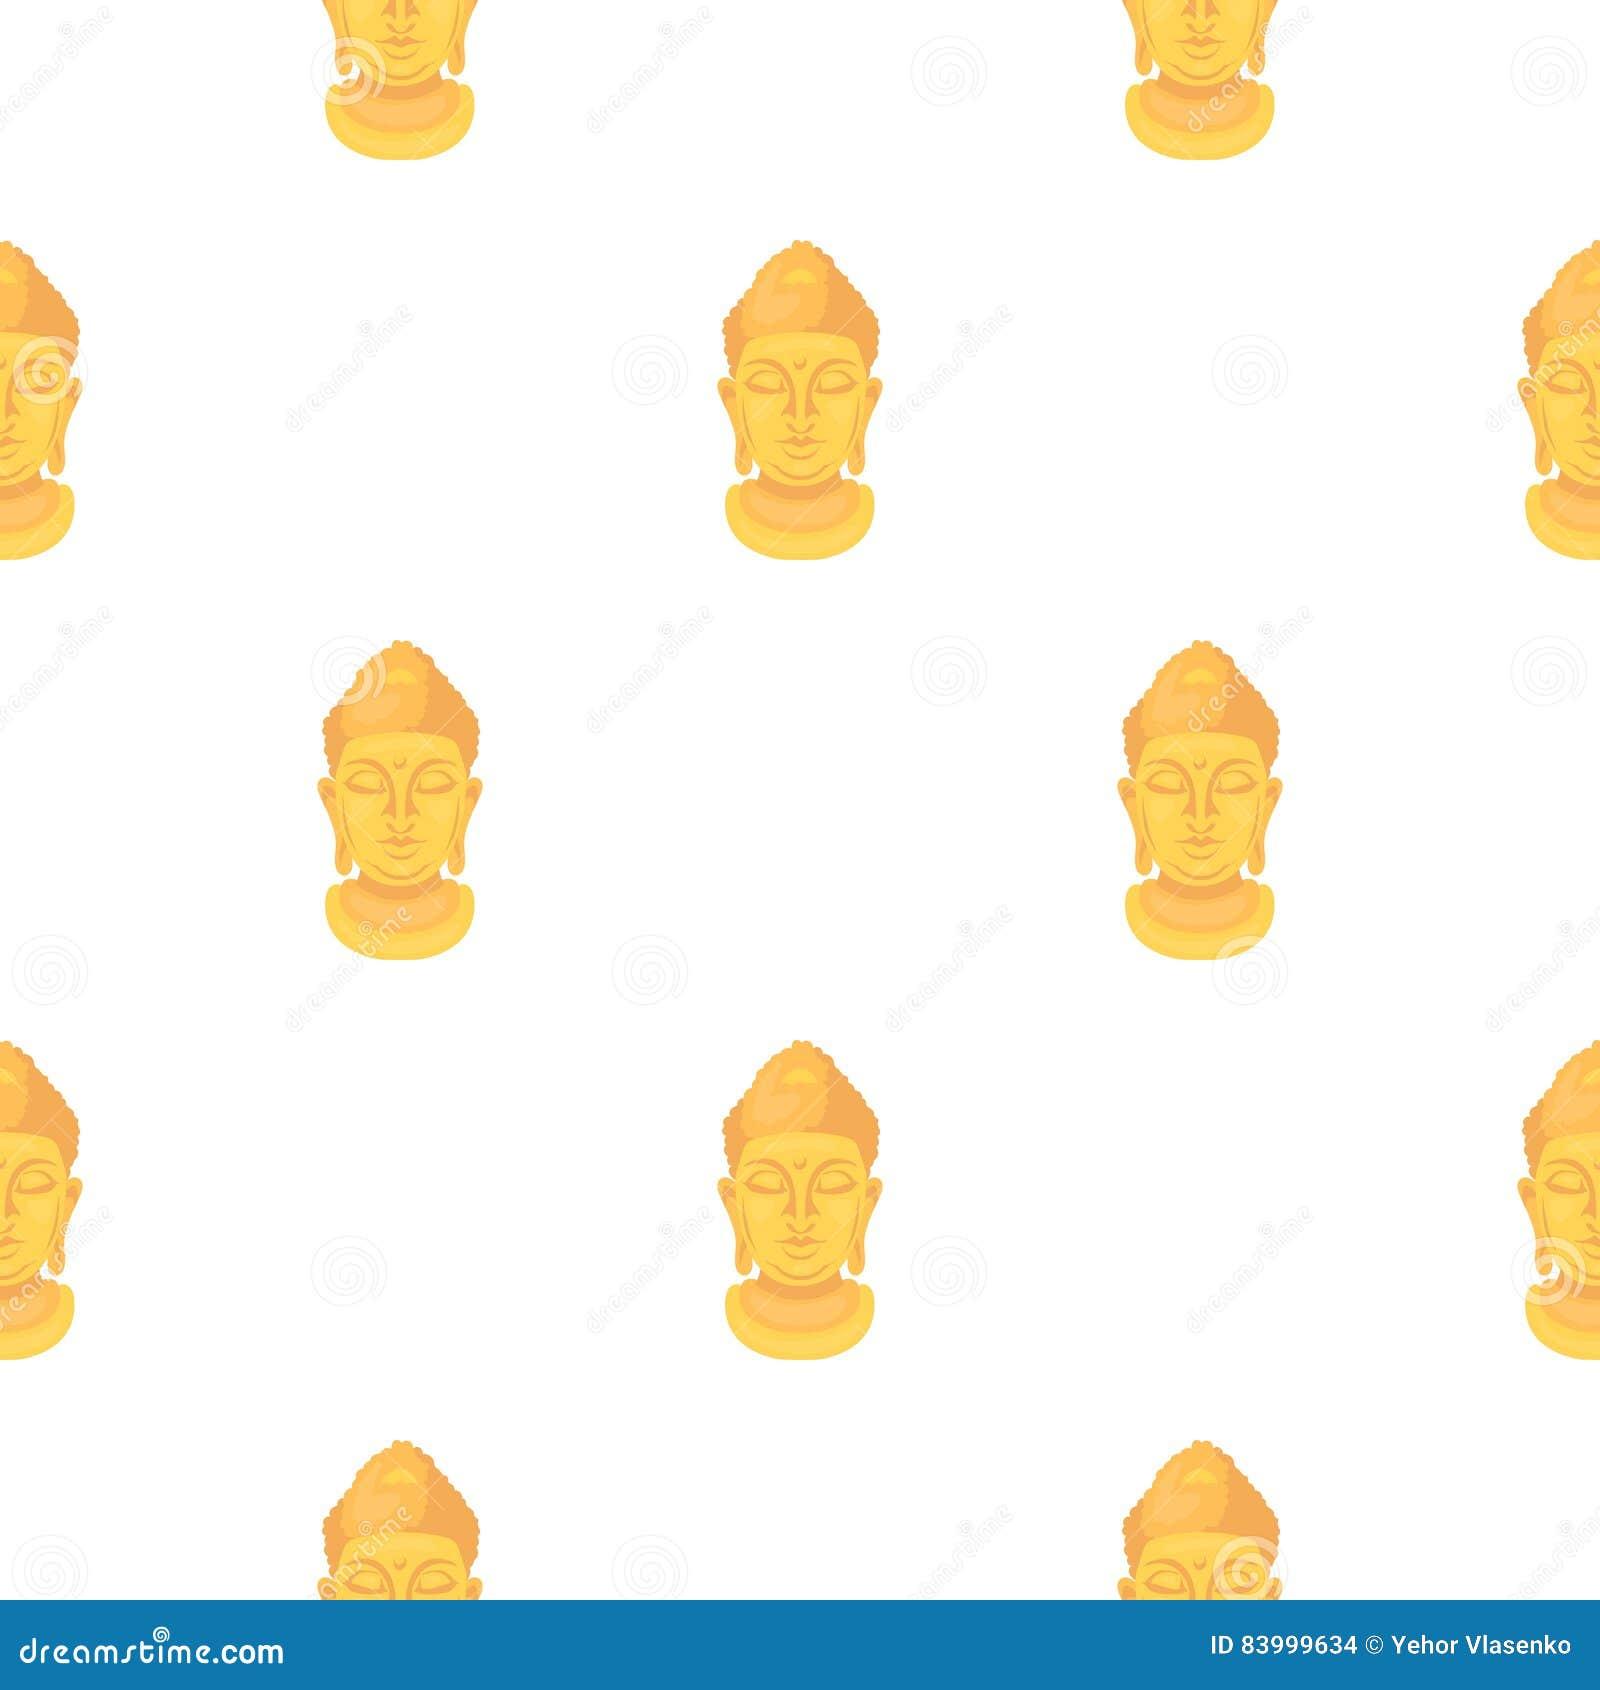 Buddha icon in cartoon style on white background. Religion pattern stock vector illustration.